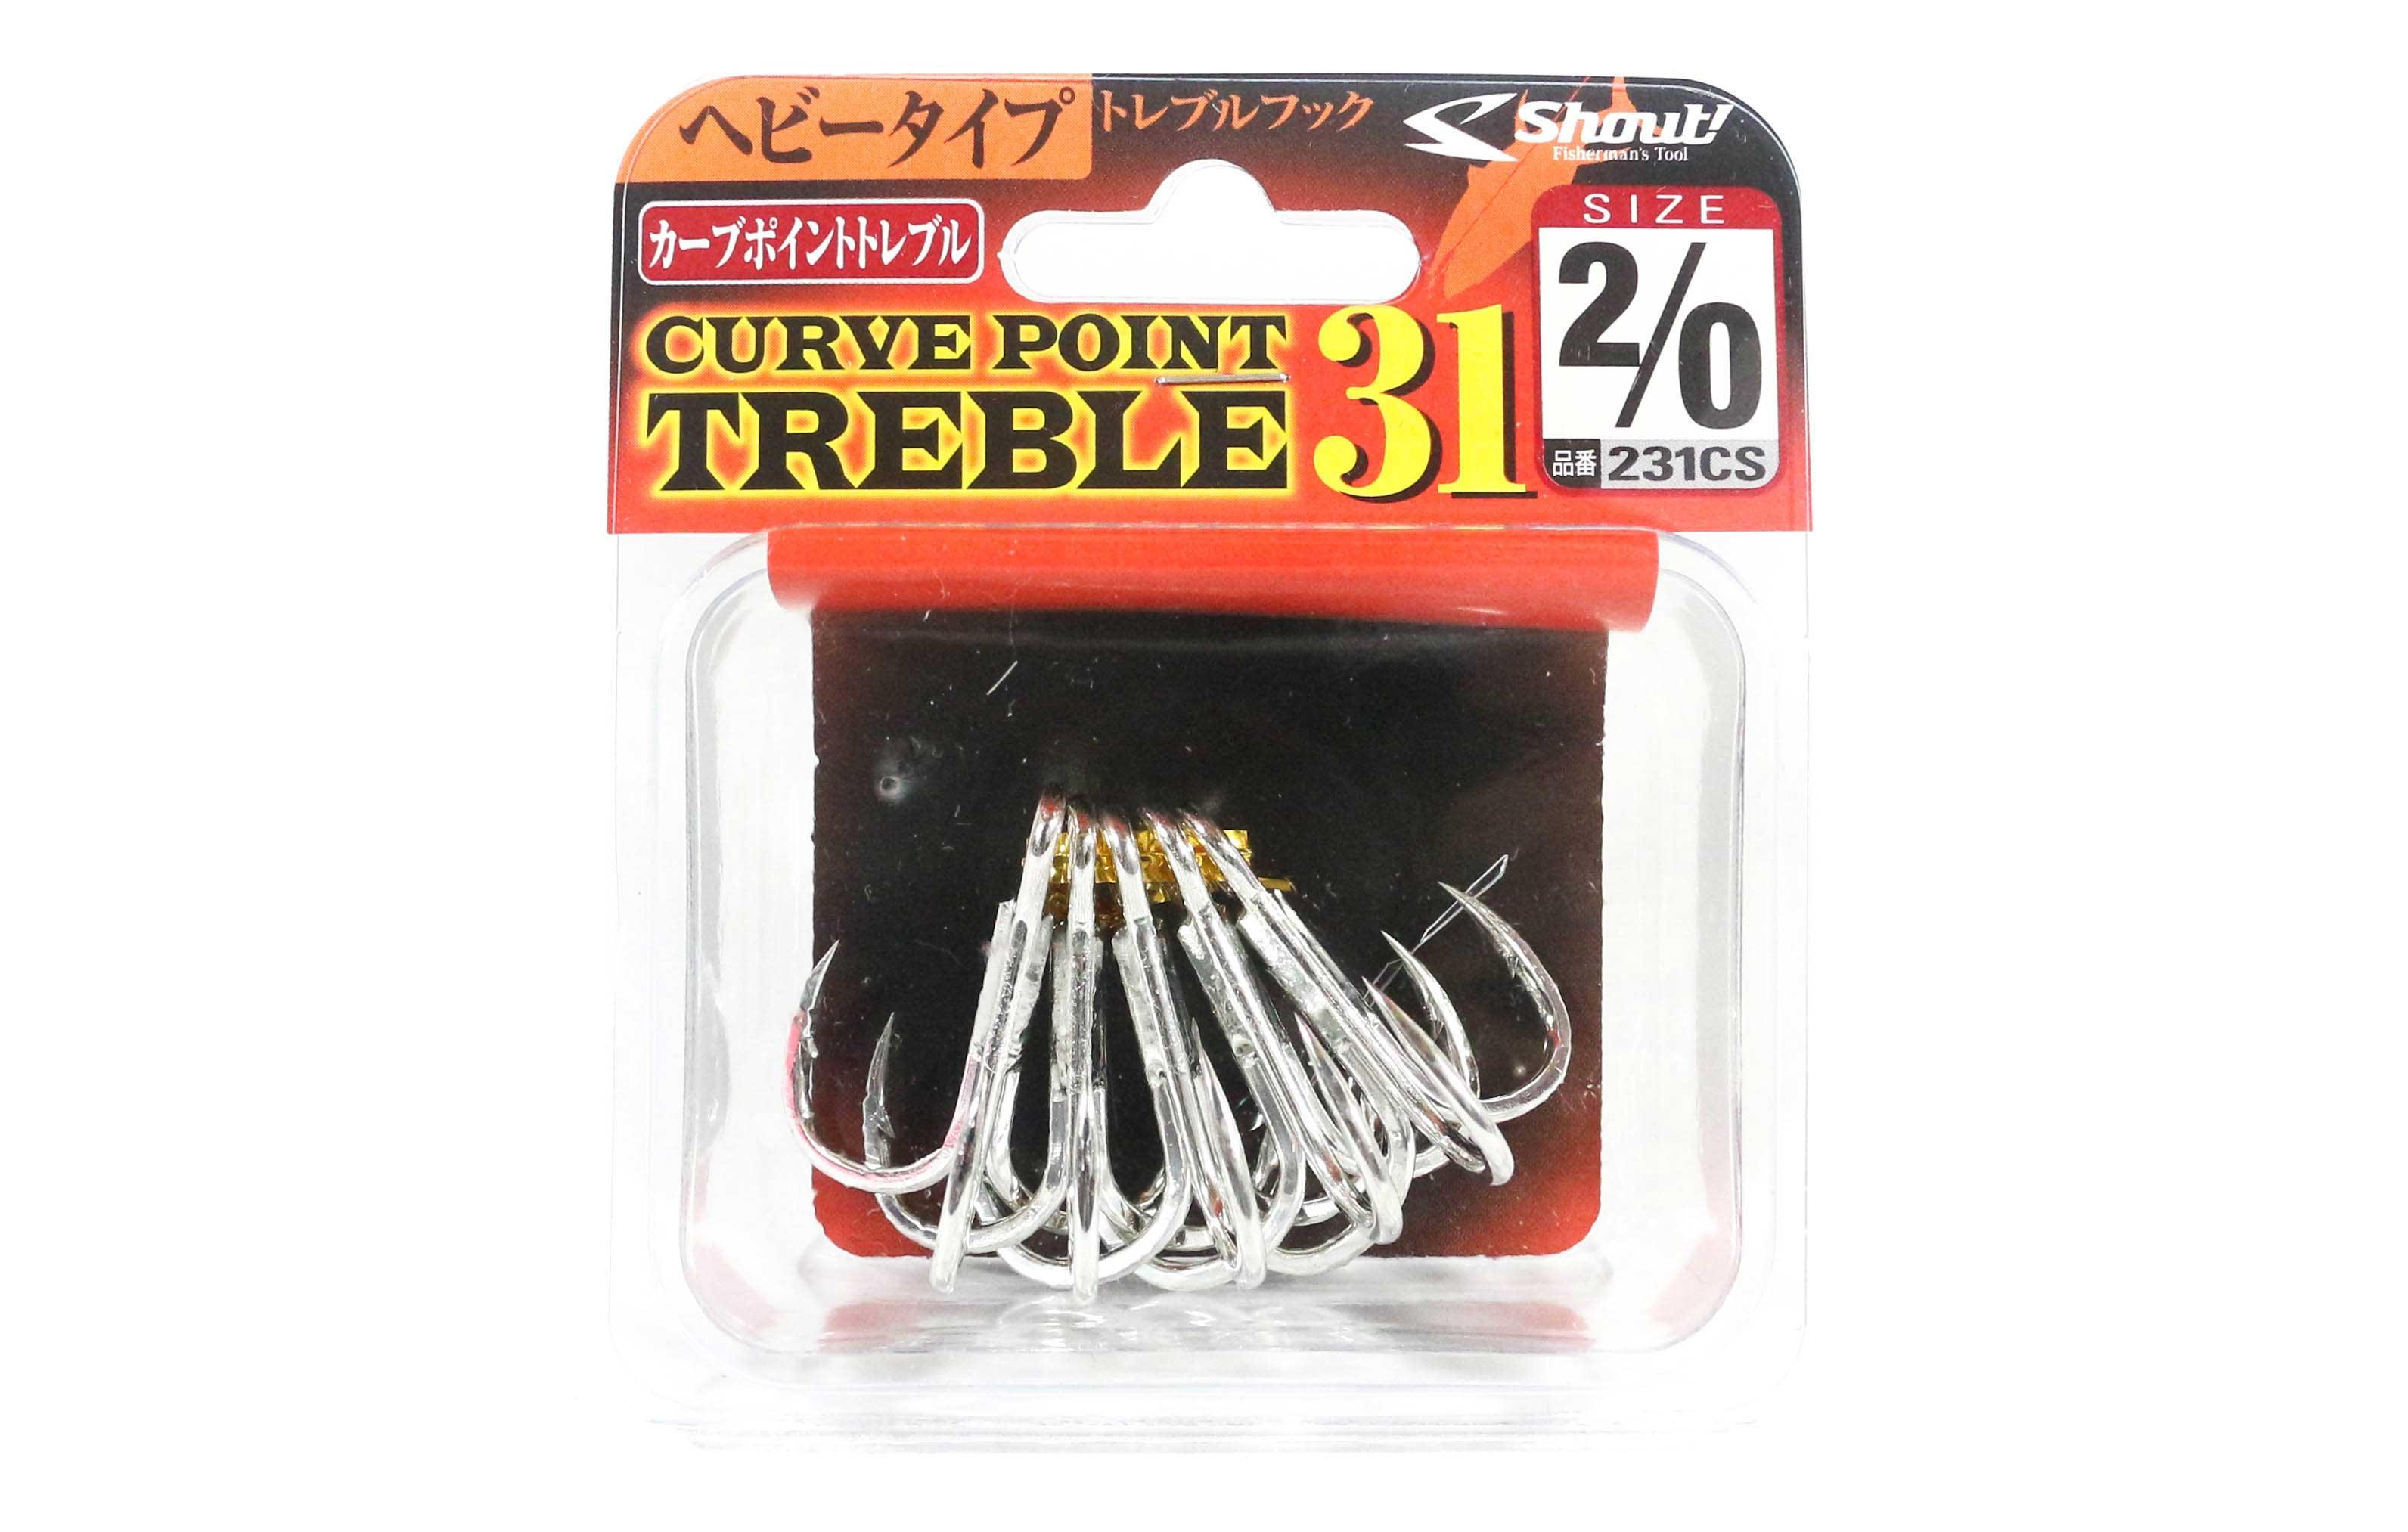 Shout 231-CS Curve Point Treble Hook Heavy Duty Size 2/0 (1559)